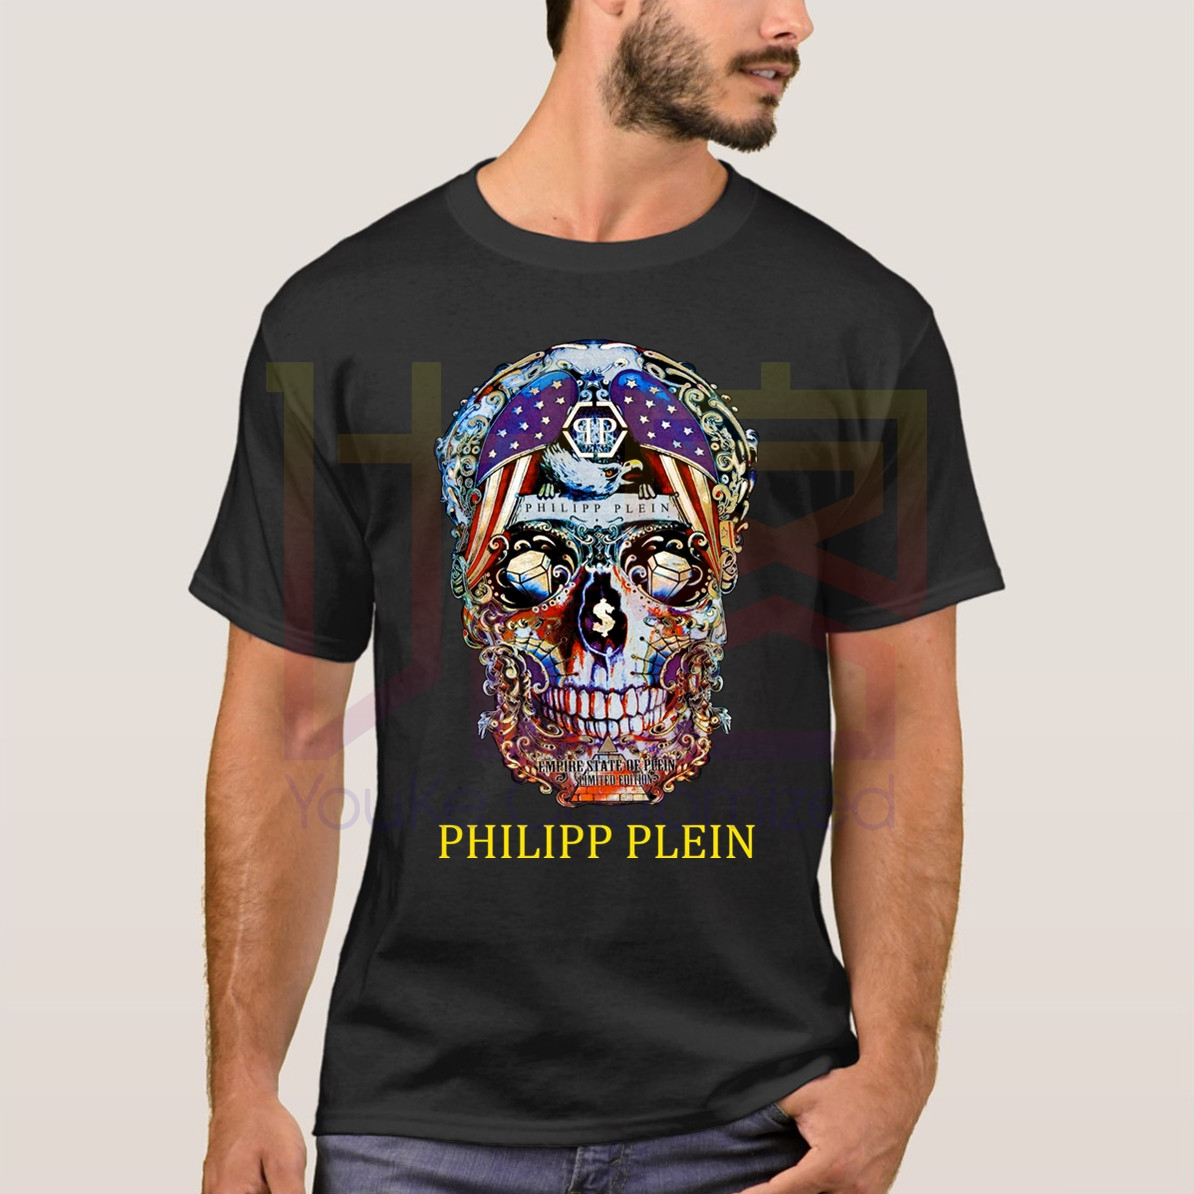 Retro Phillip Plein T-shirt Cotton Graphic Shirt Unoficial Stone-Island T-Shirt Hip Hop Novelty Men Brand Clothing T-Shirt